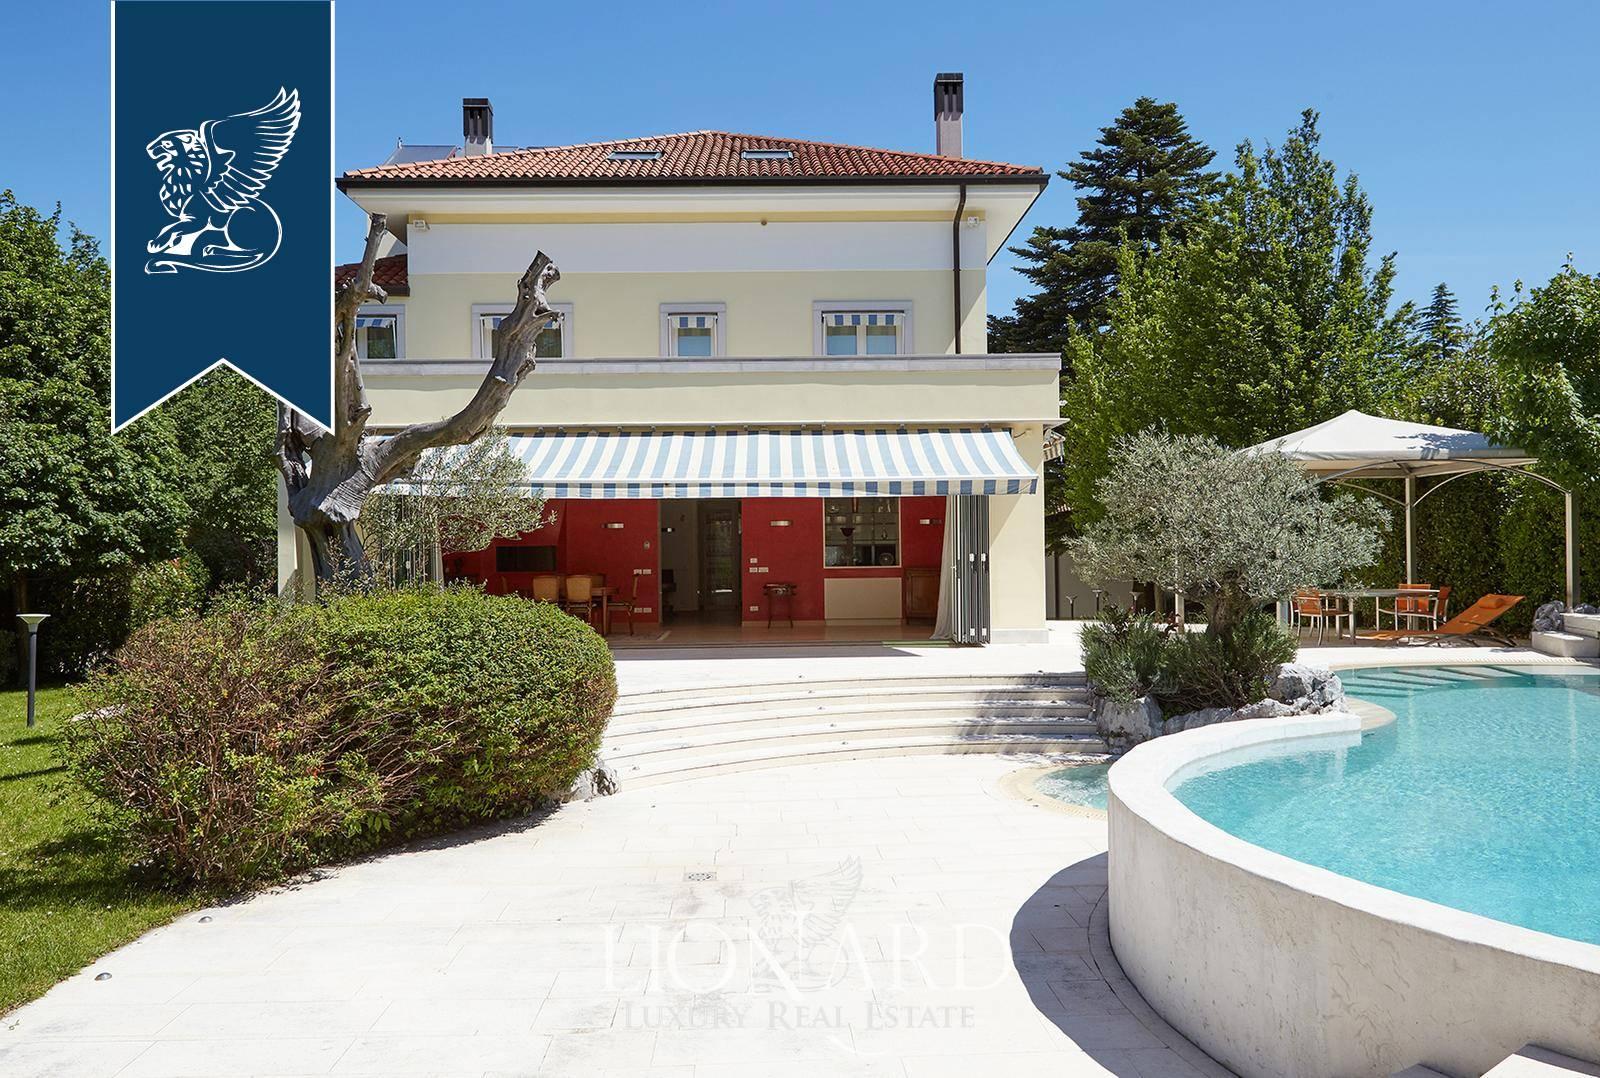 Villa in Vendita a Trieste: 0 locali, 500 mq - Foto 7